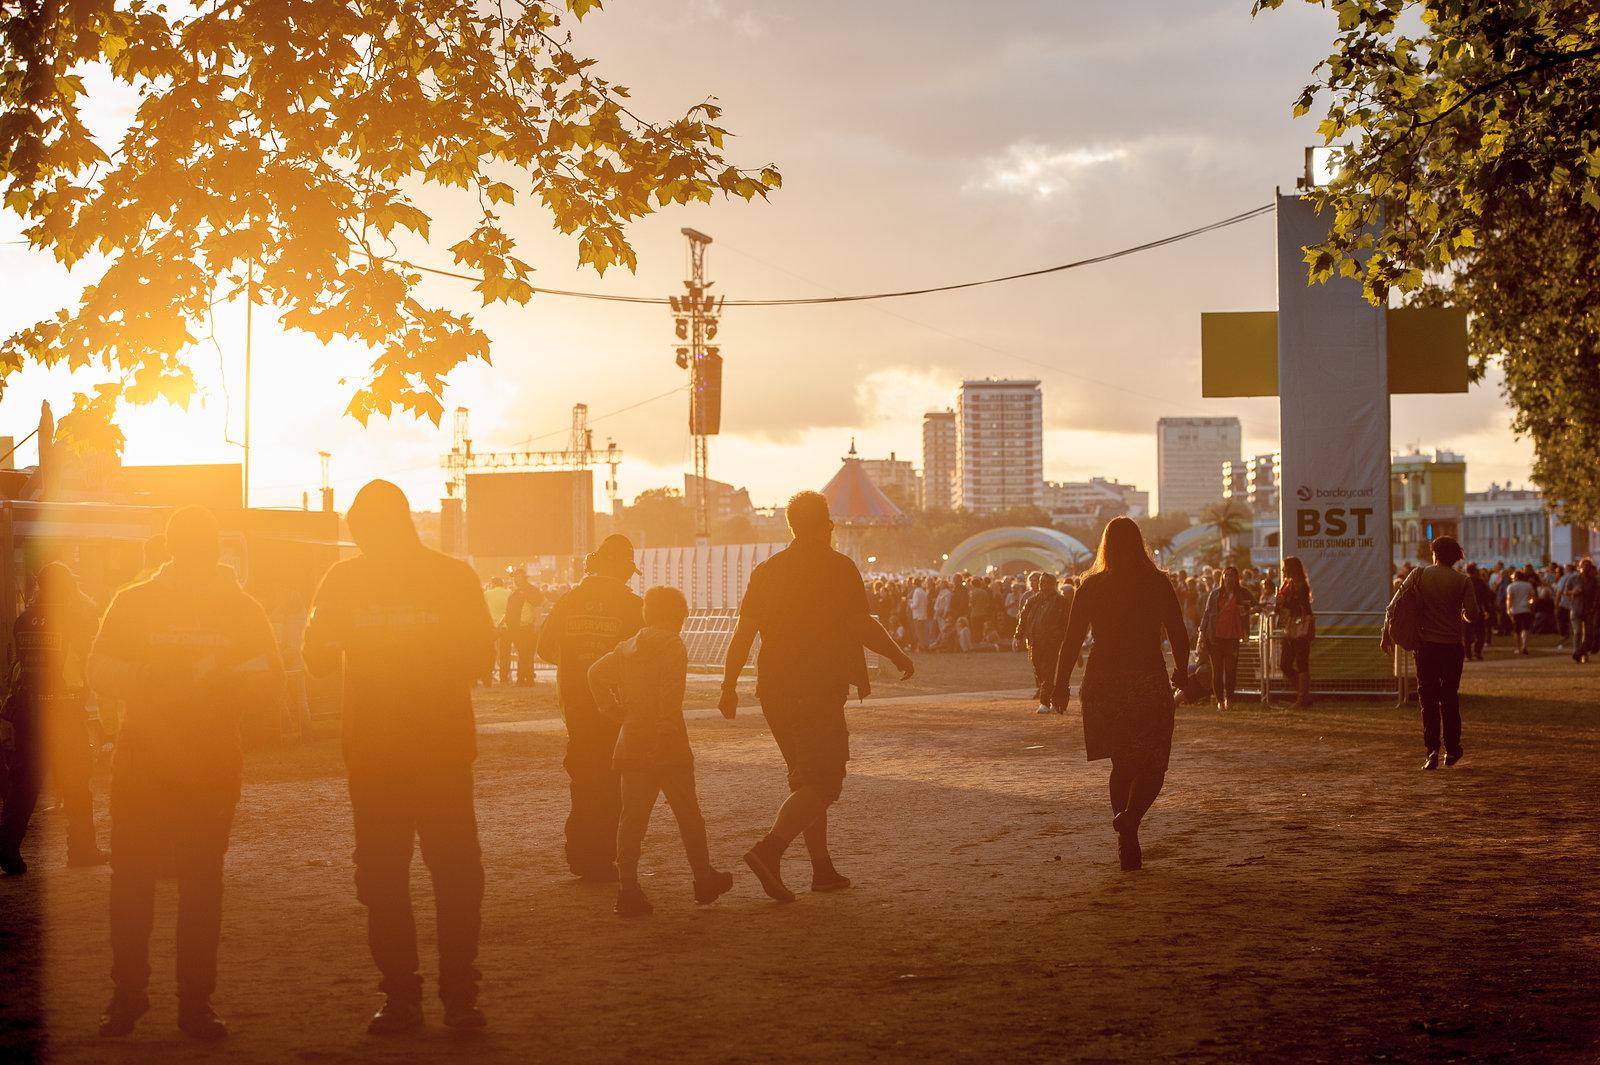 Barclaycard Presents British Summer Time Festival 2016